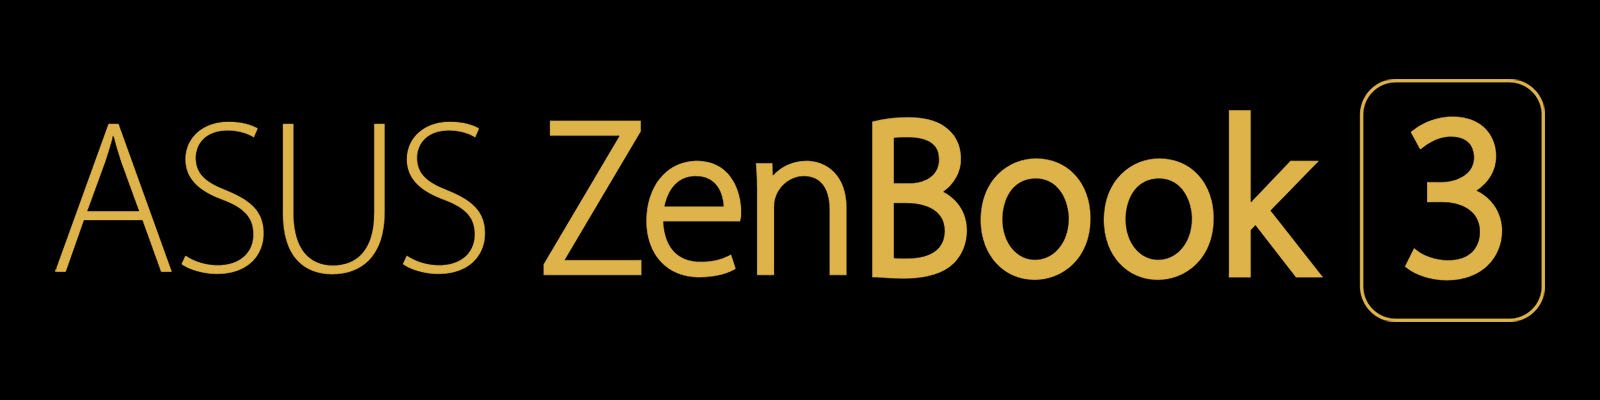 ASUS ZenBook 3 ロゴ